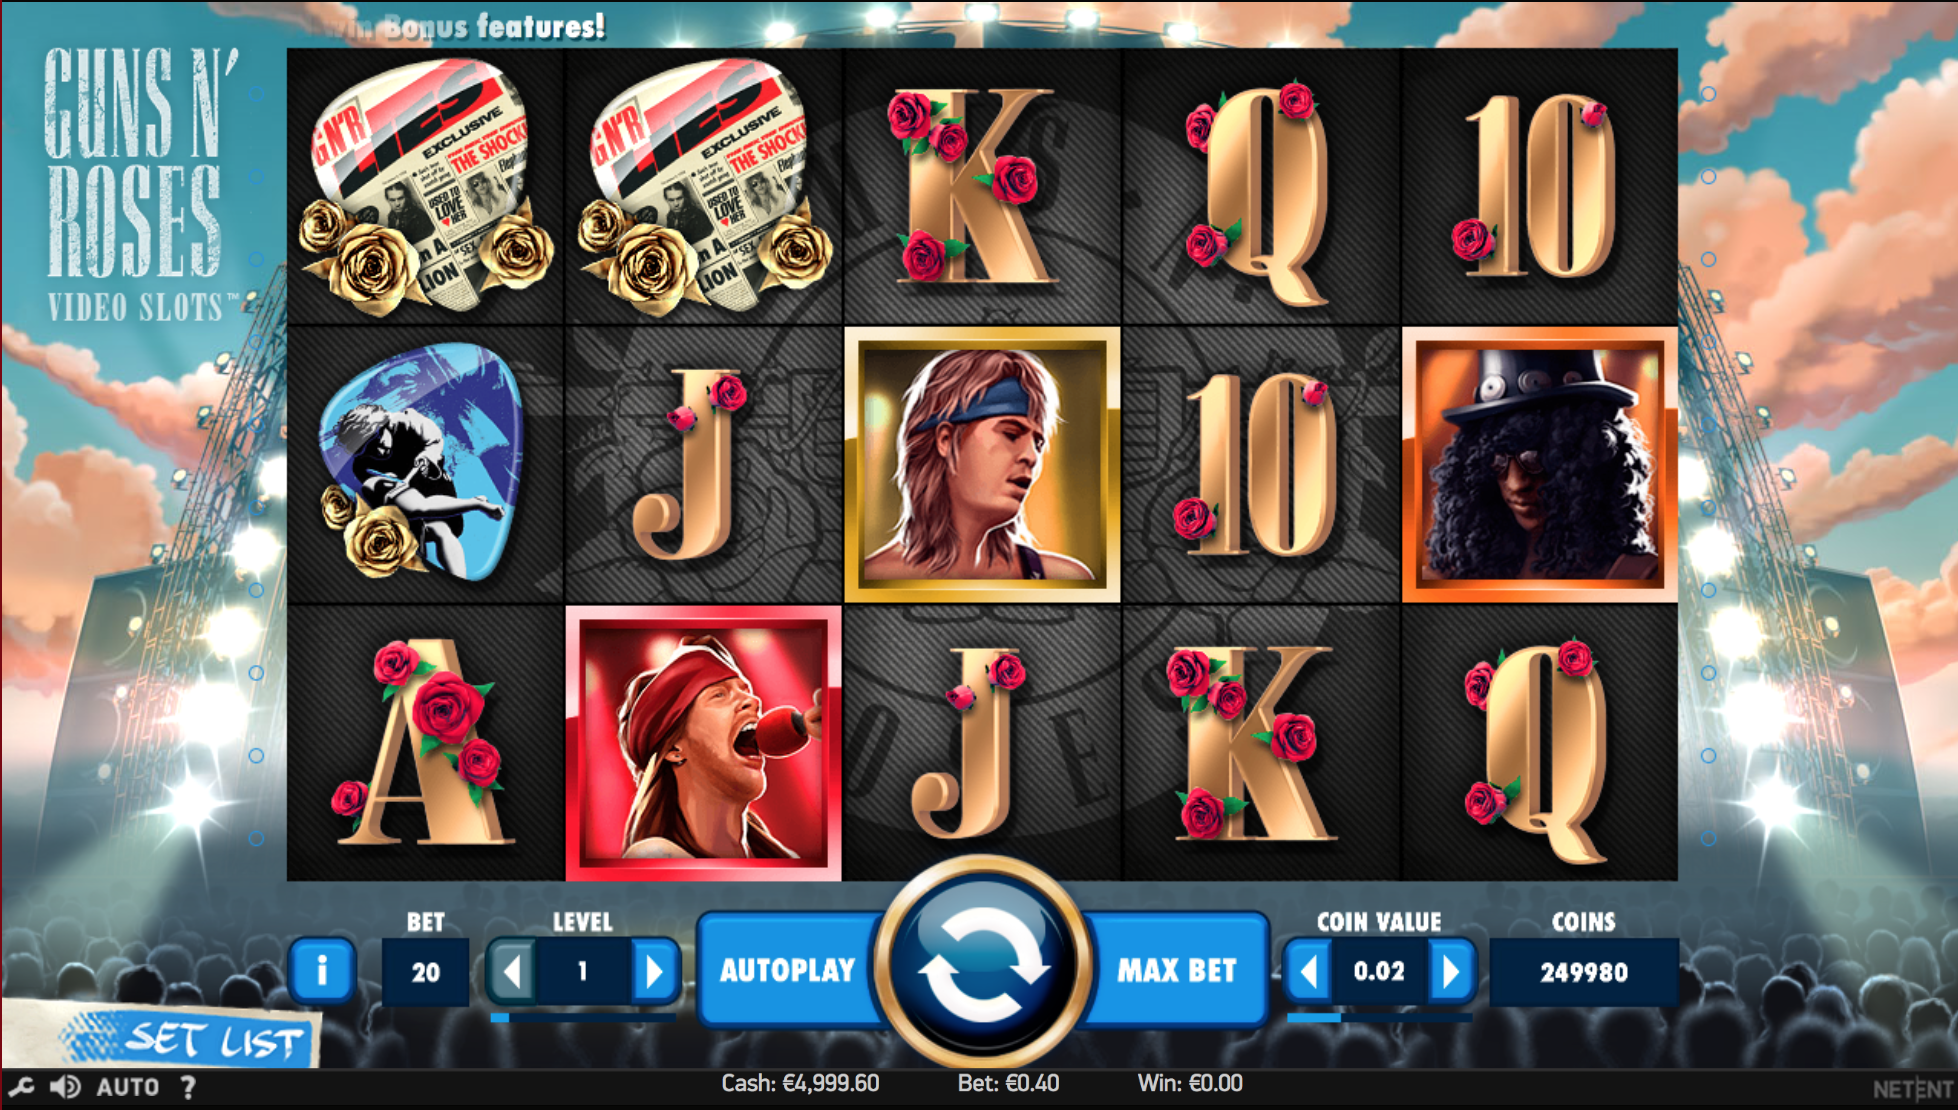 Pch blackjack